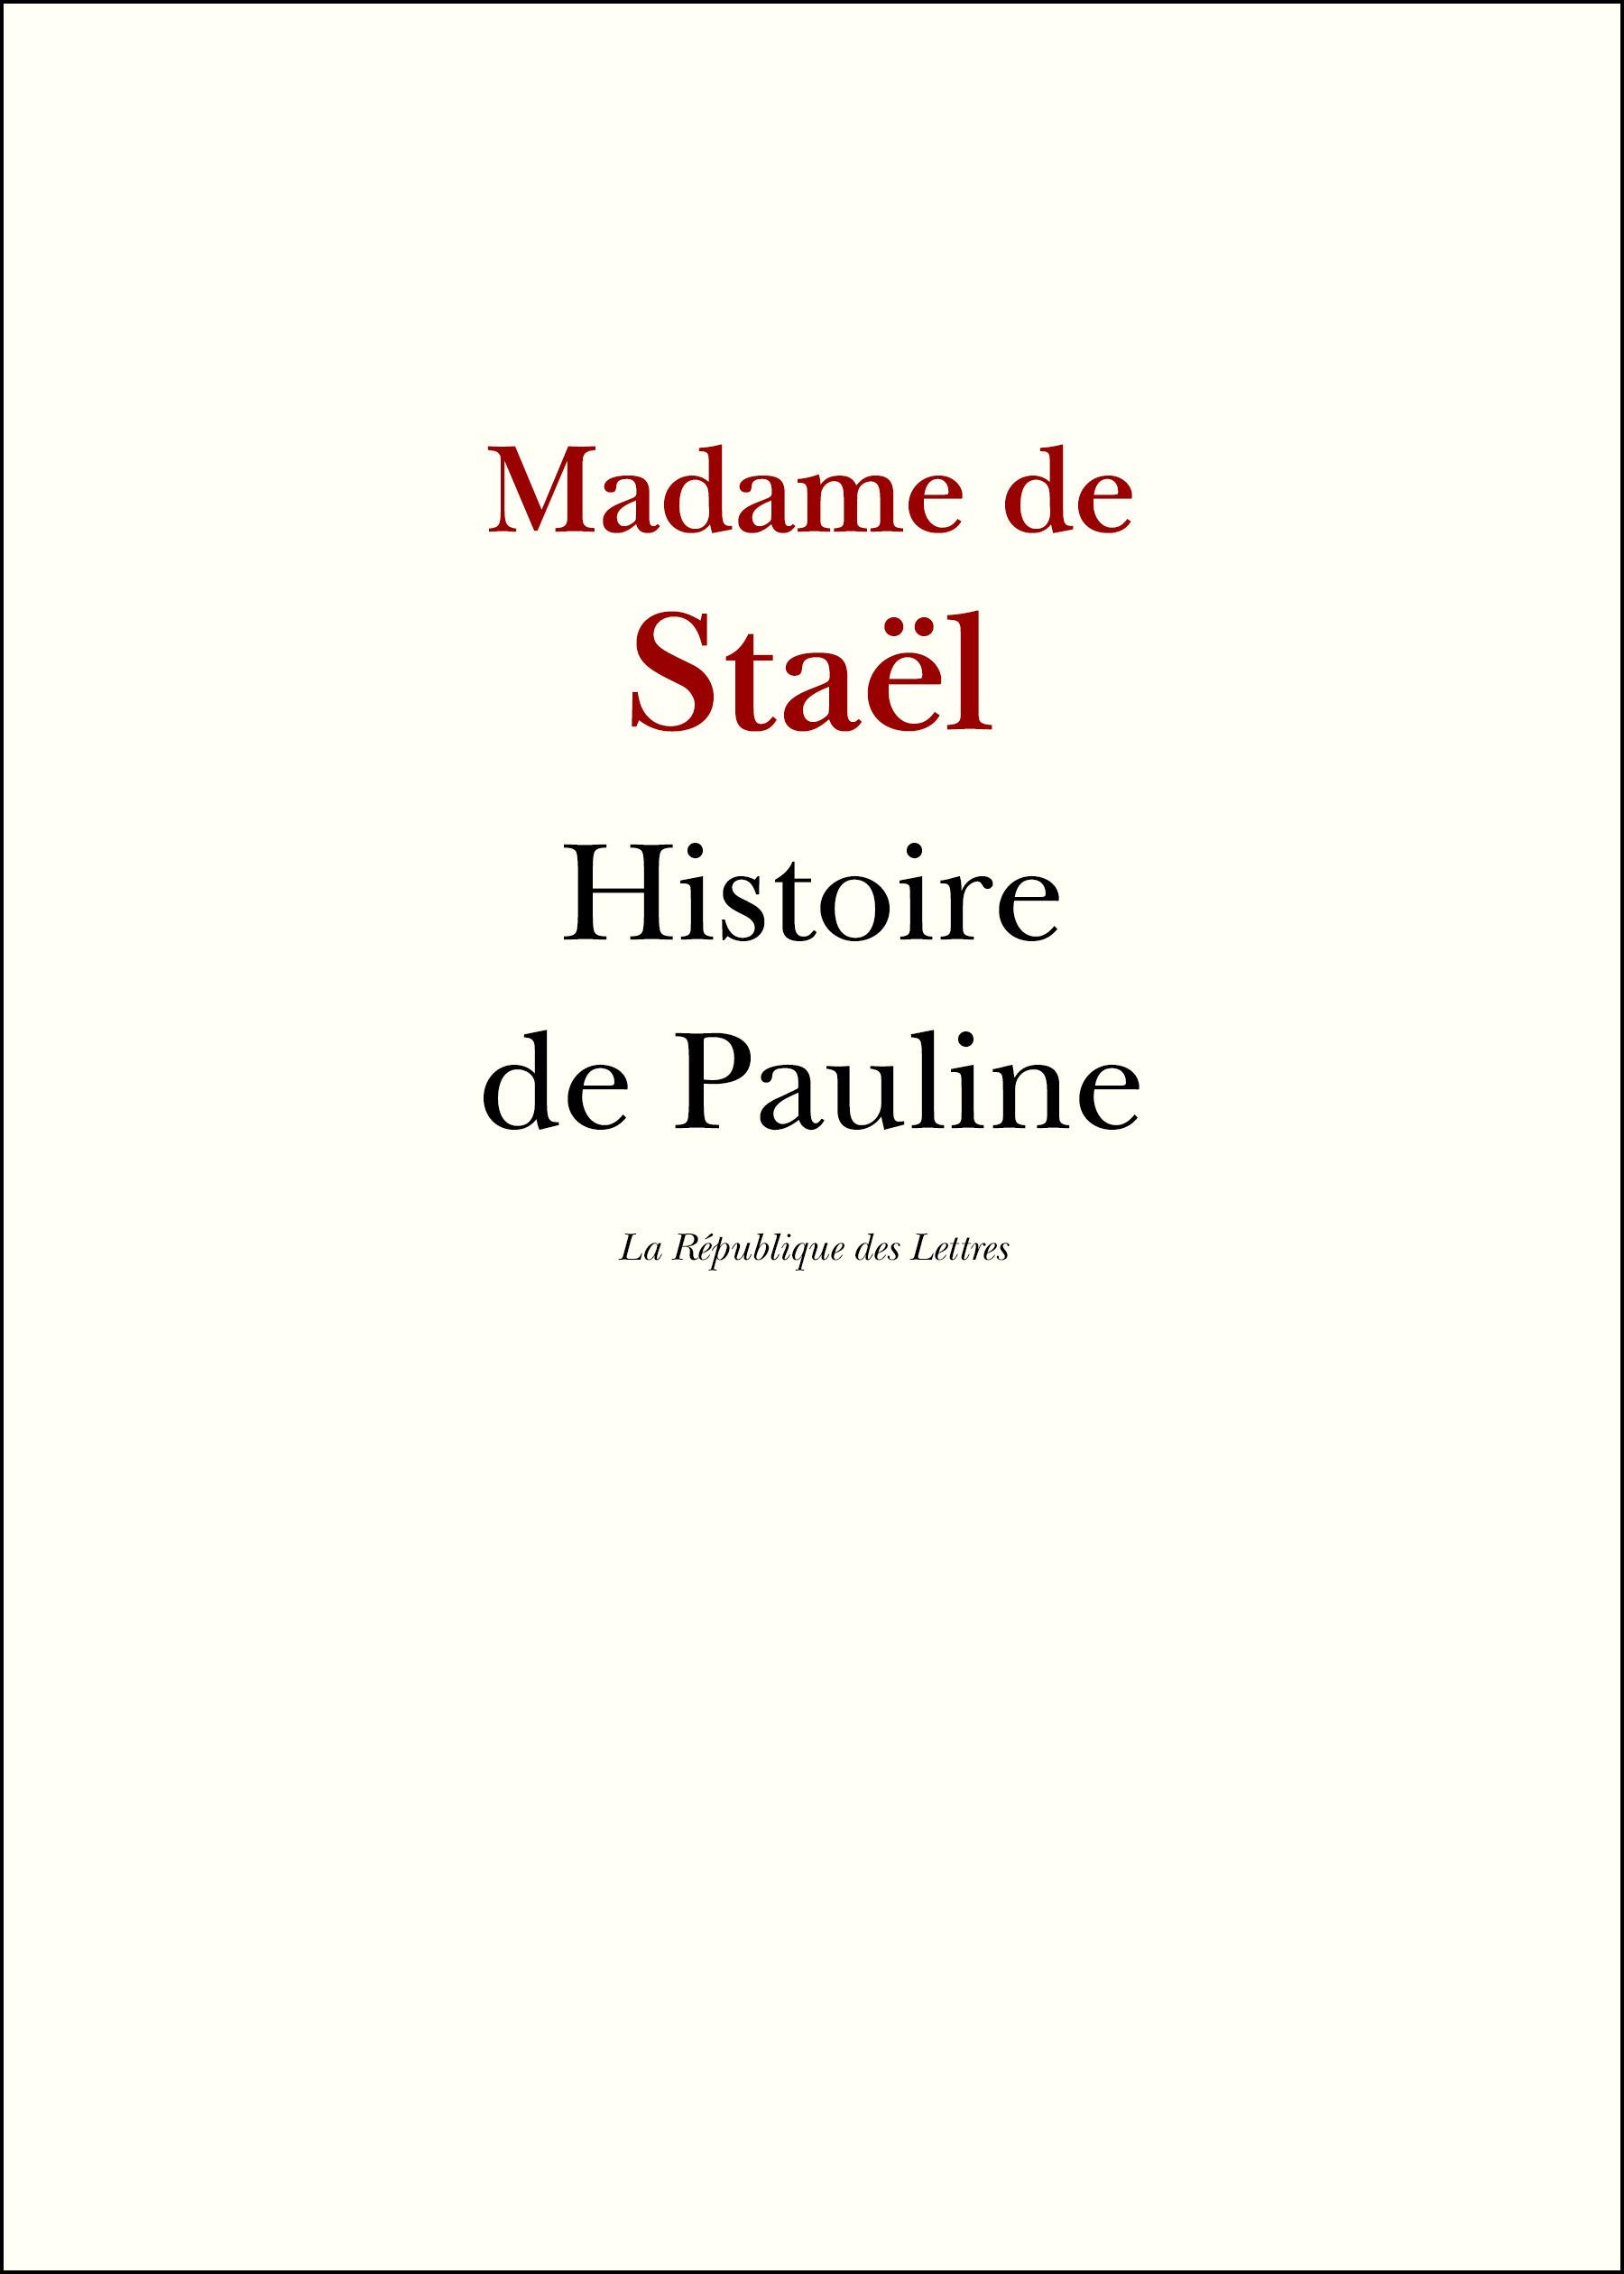 Histoire de Pauline